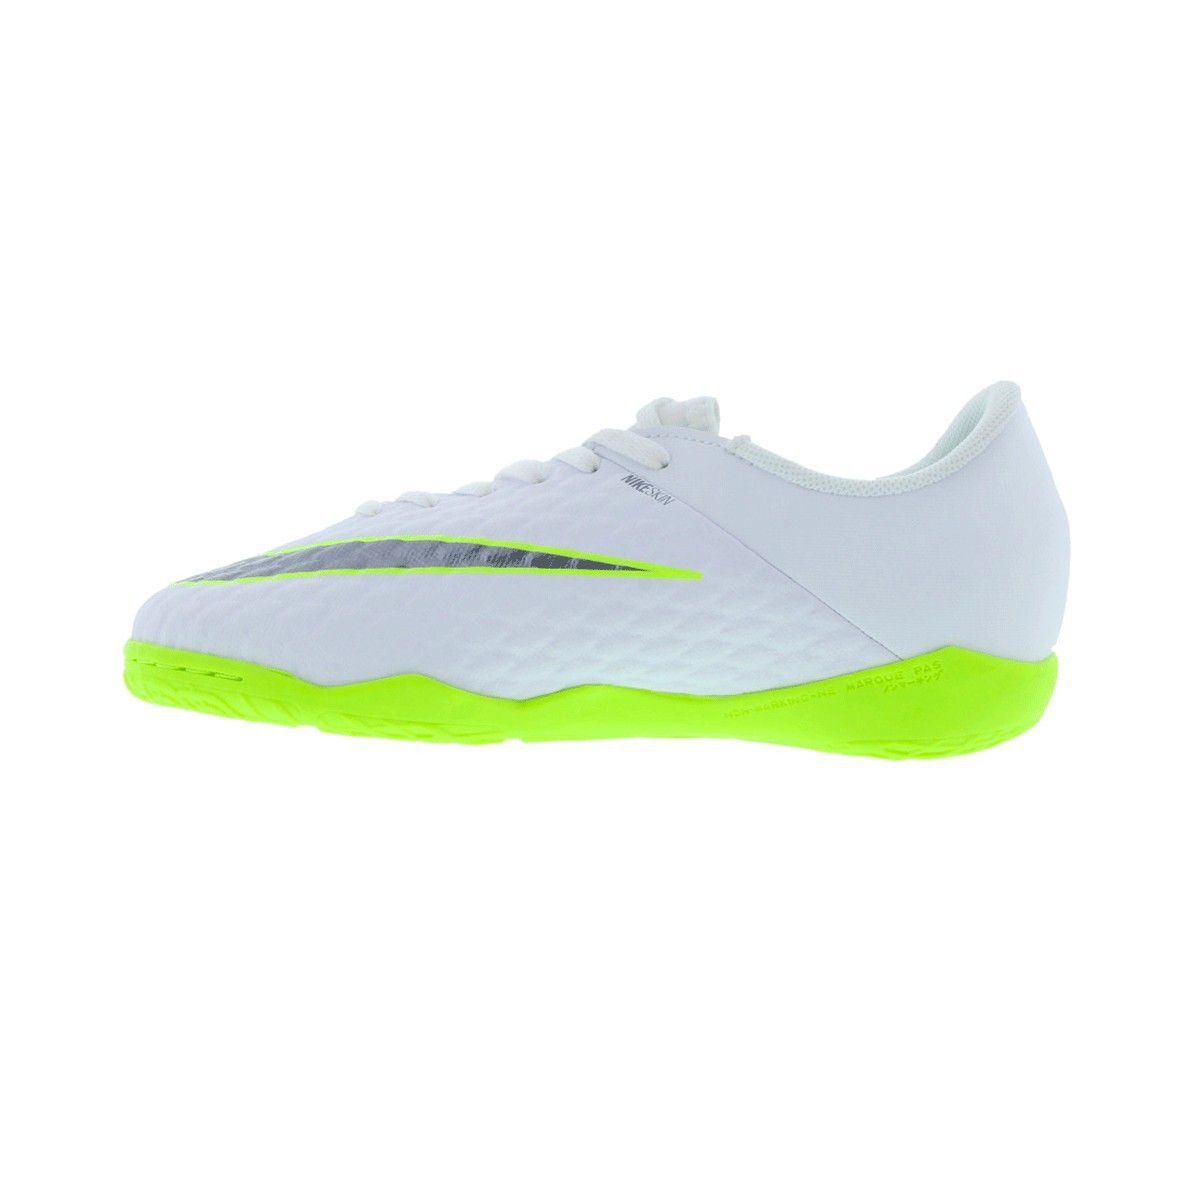 Chuteira Nike Futsal PhantomX 3 Academy Branco